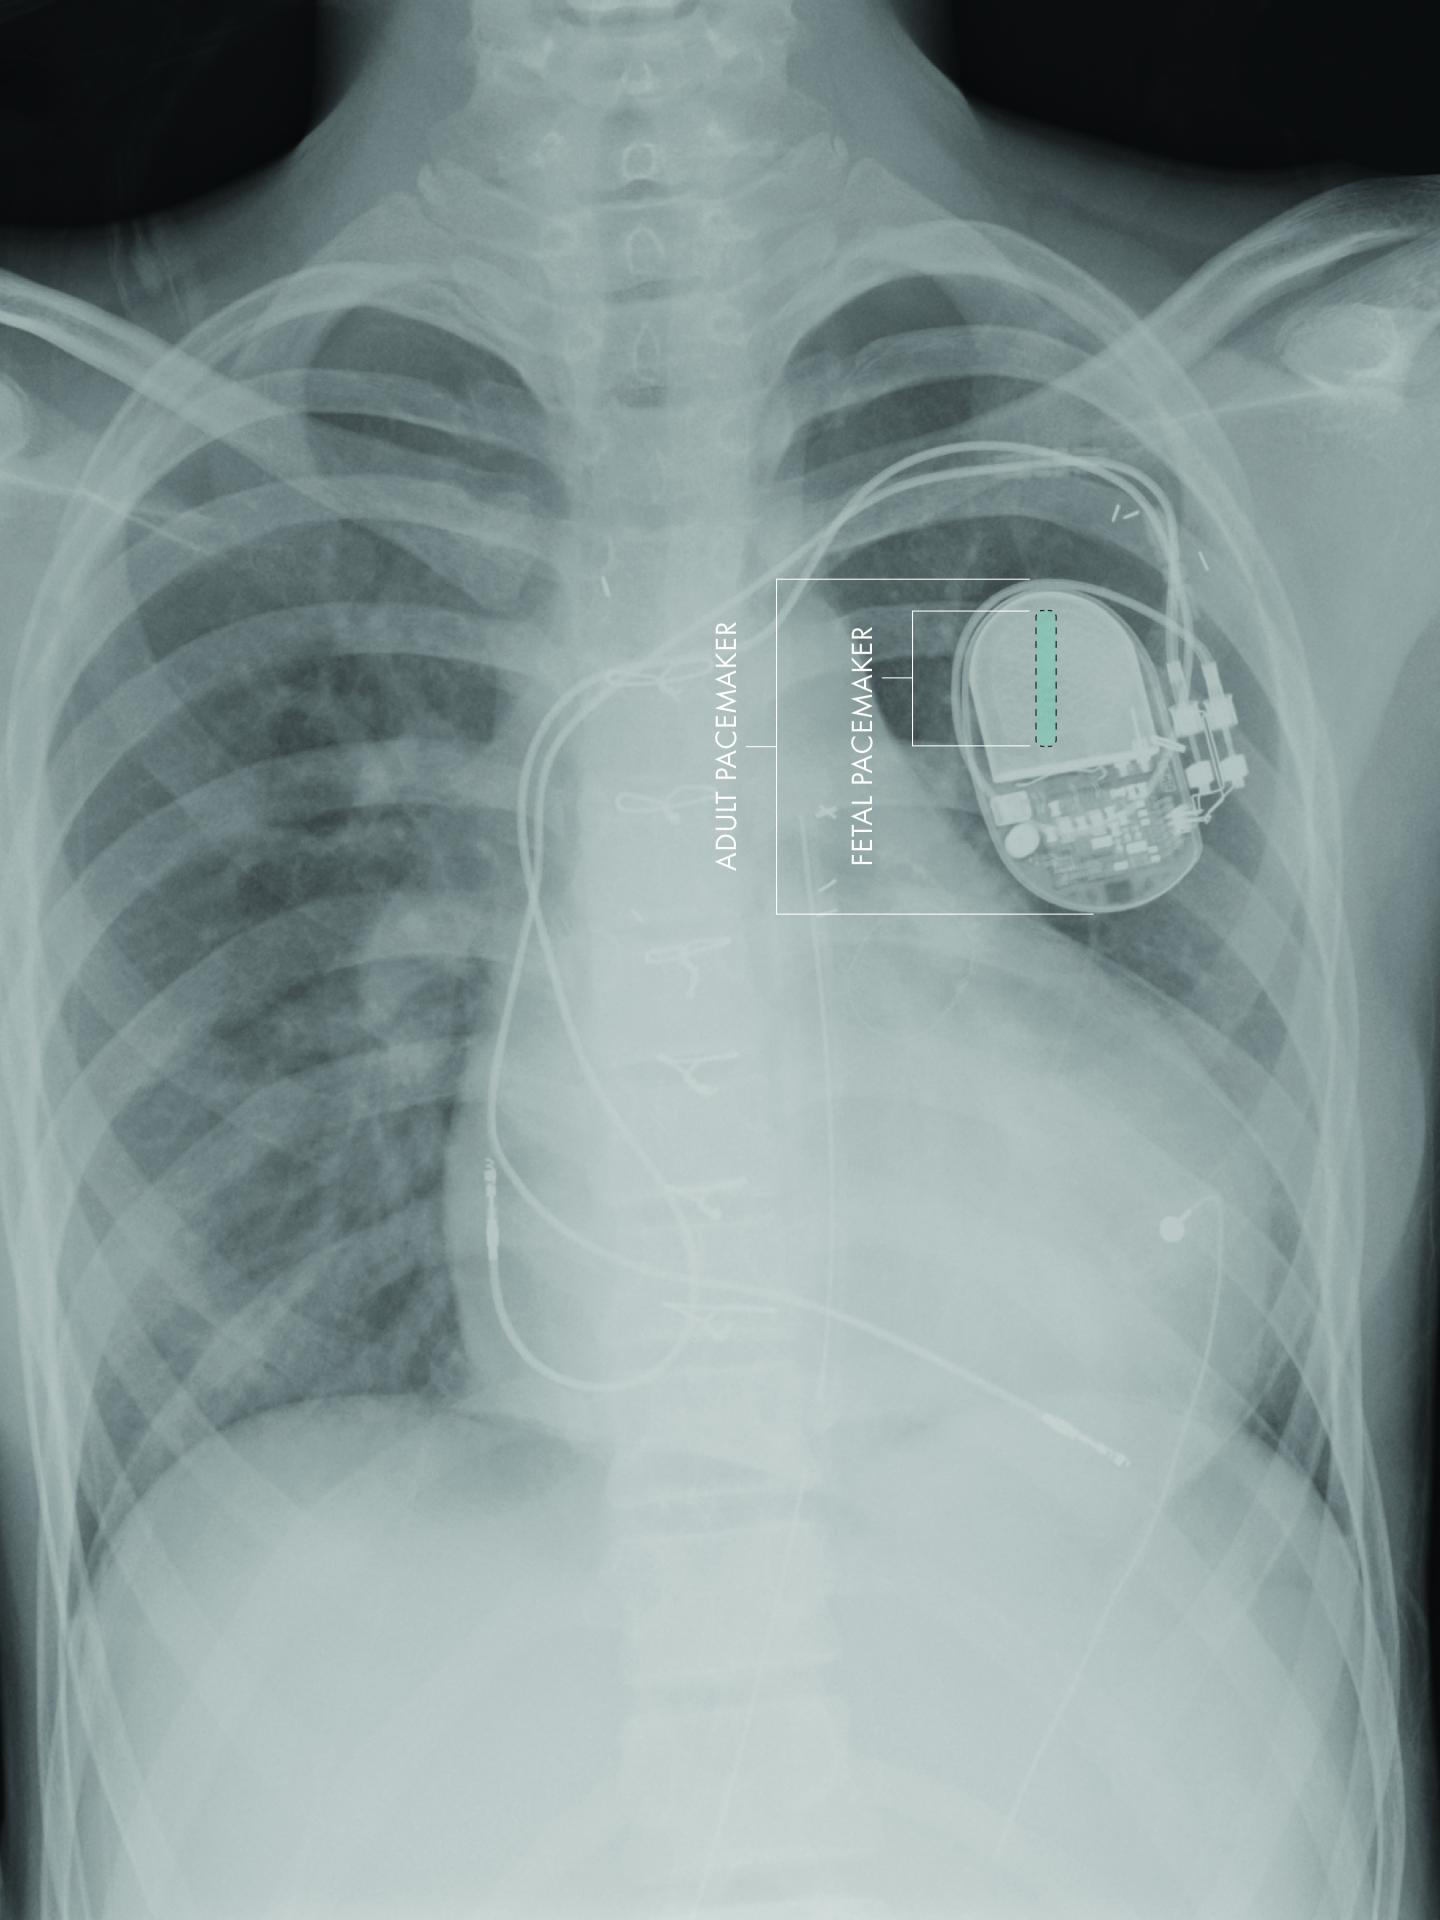 El primer micromarcapasos implantable